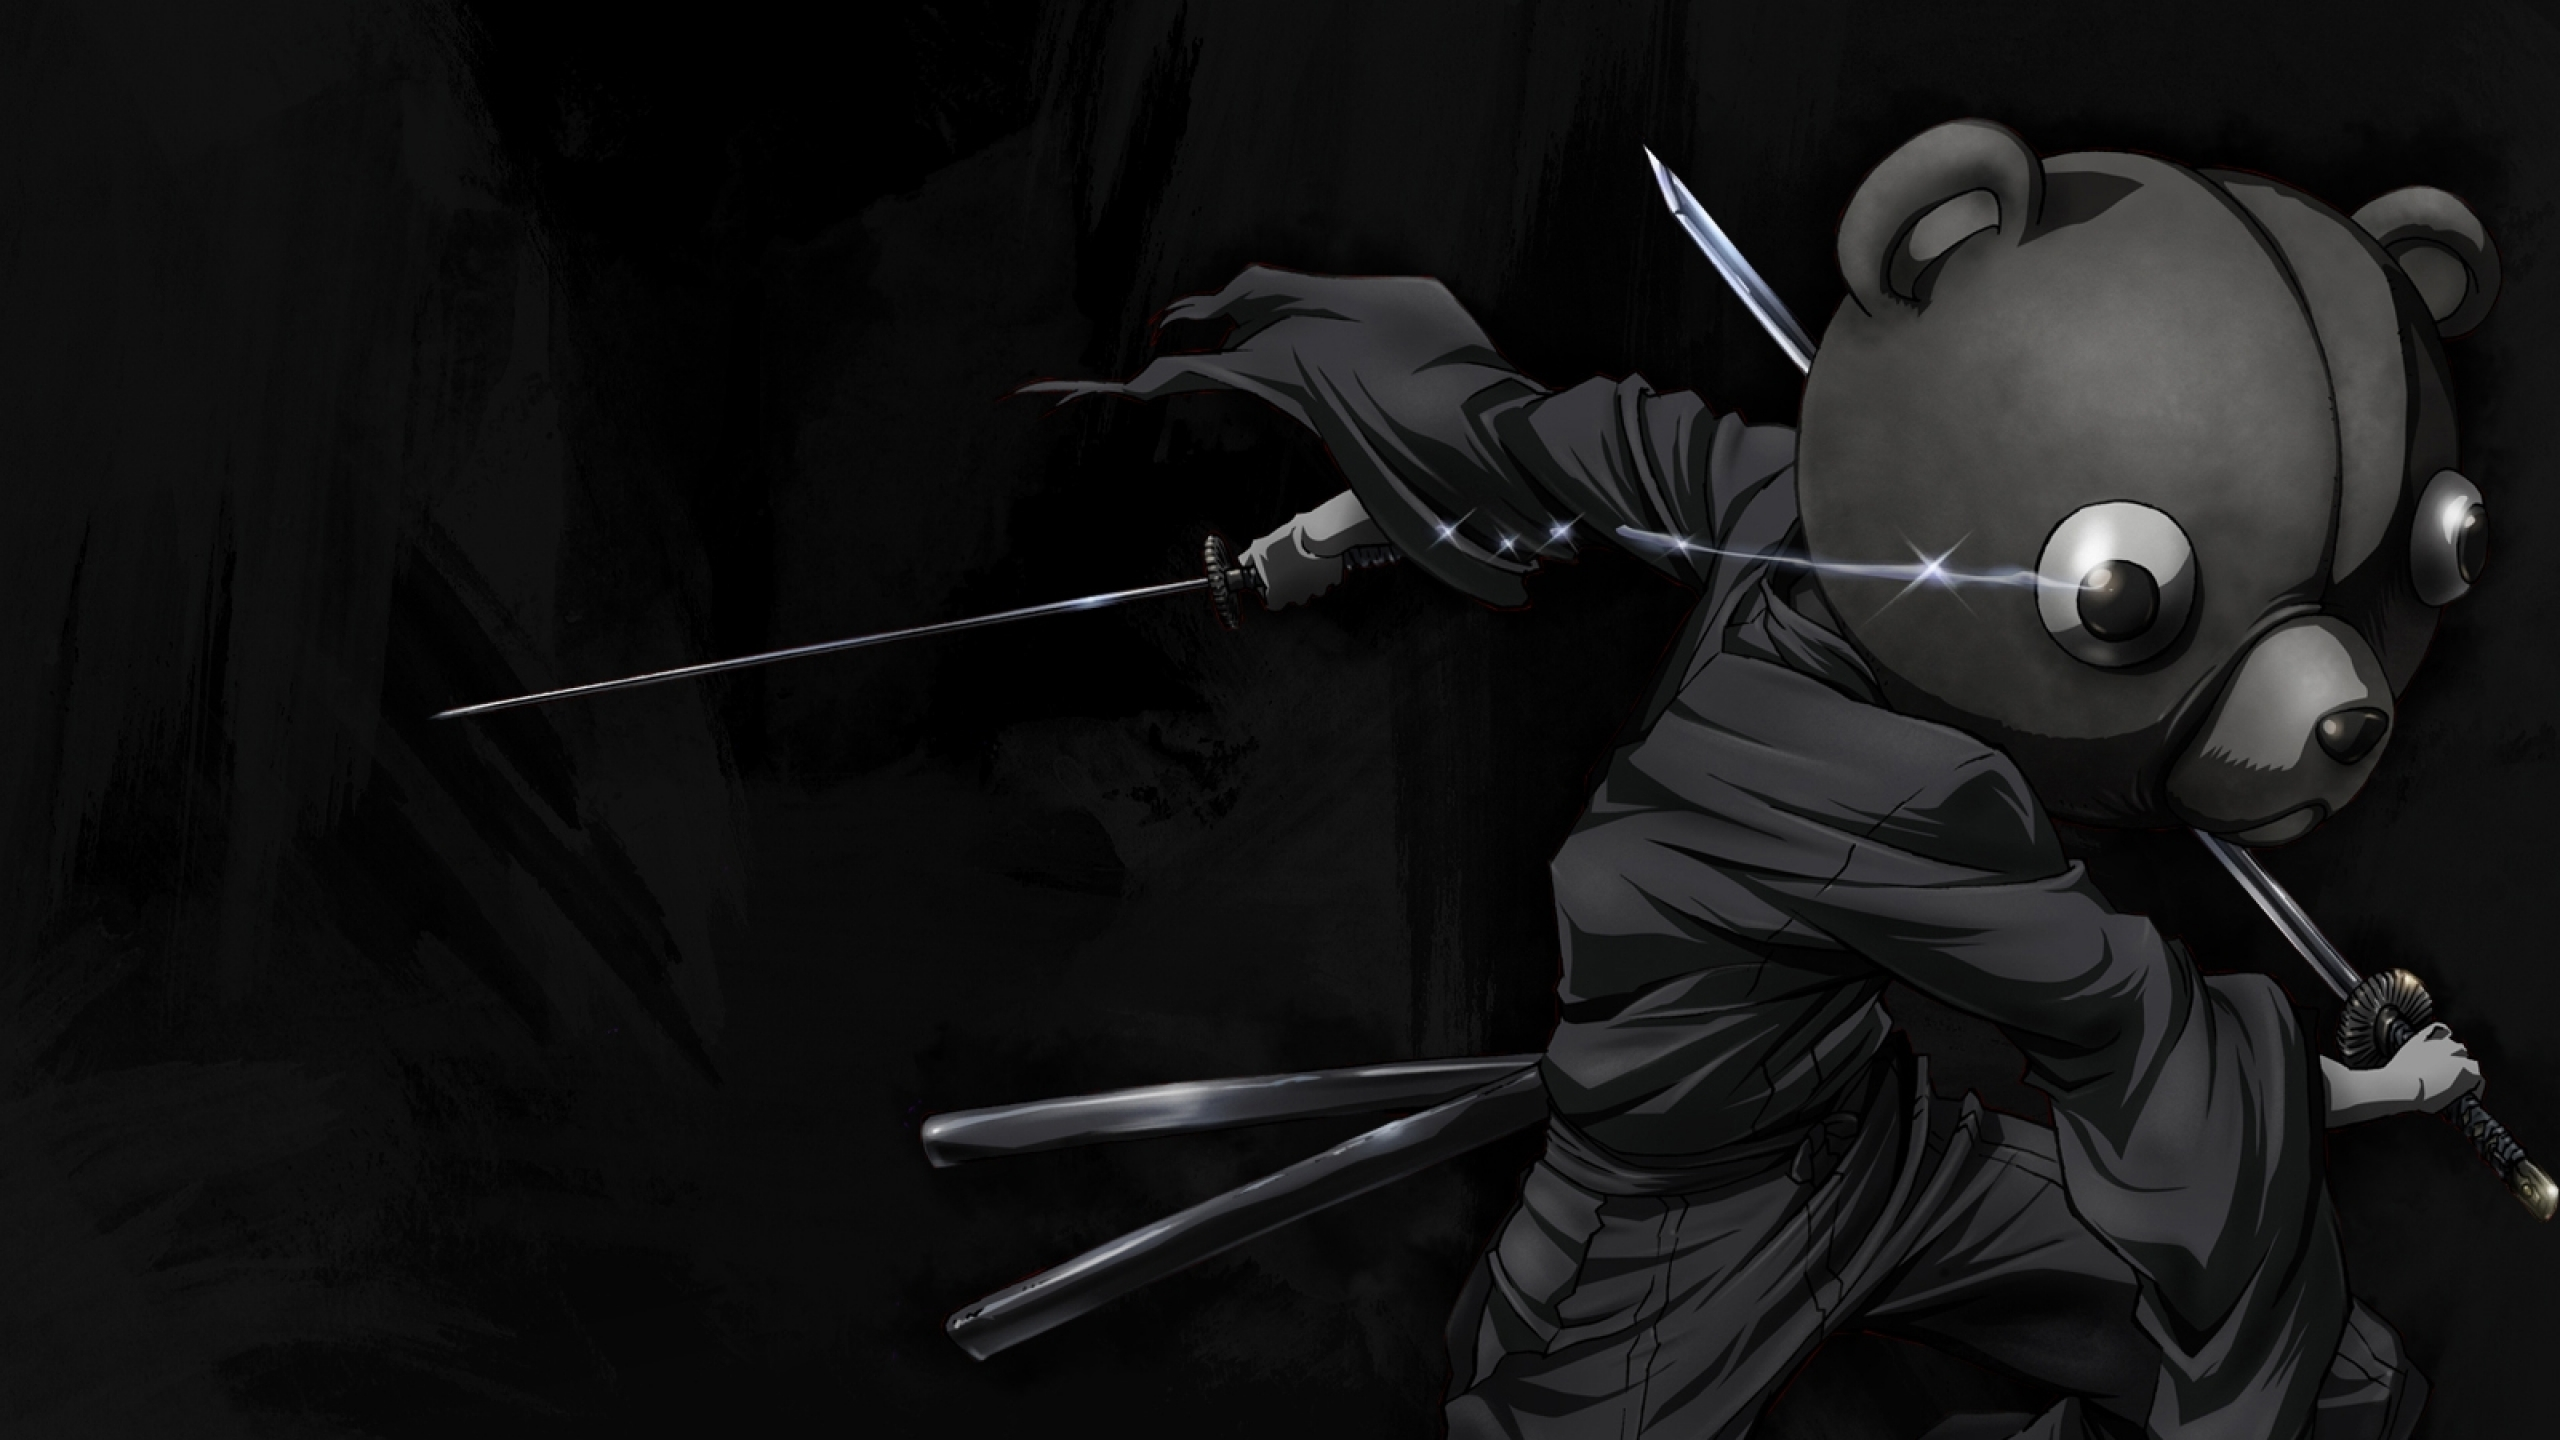 samurai simple background 1600x900 wallpaper Art HD Wallpaper download 2560x1440